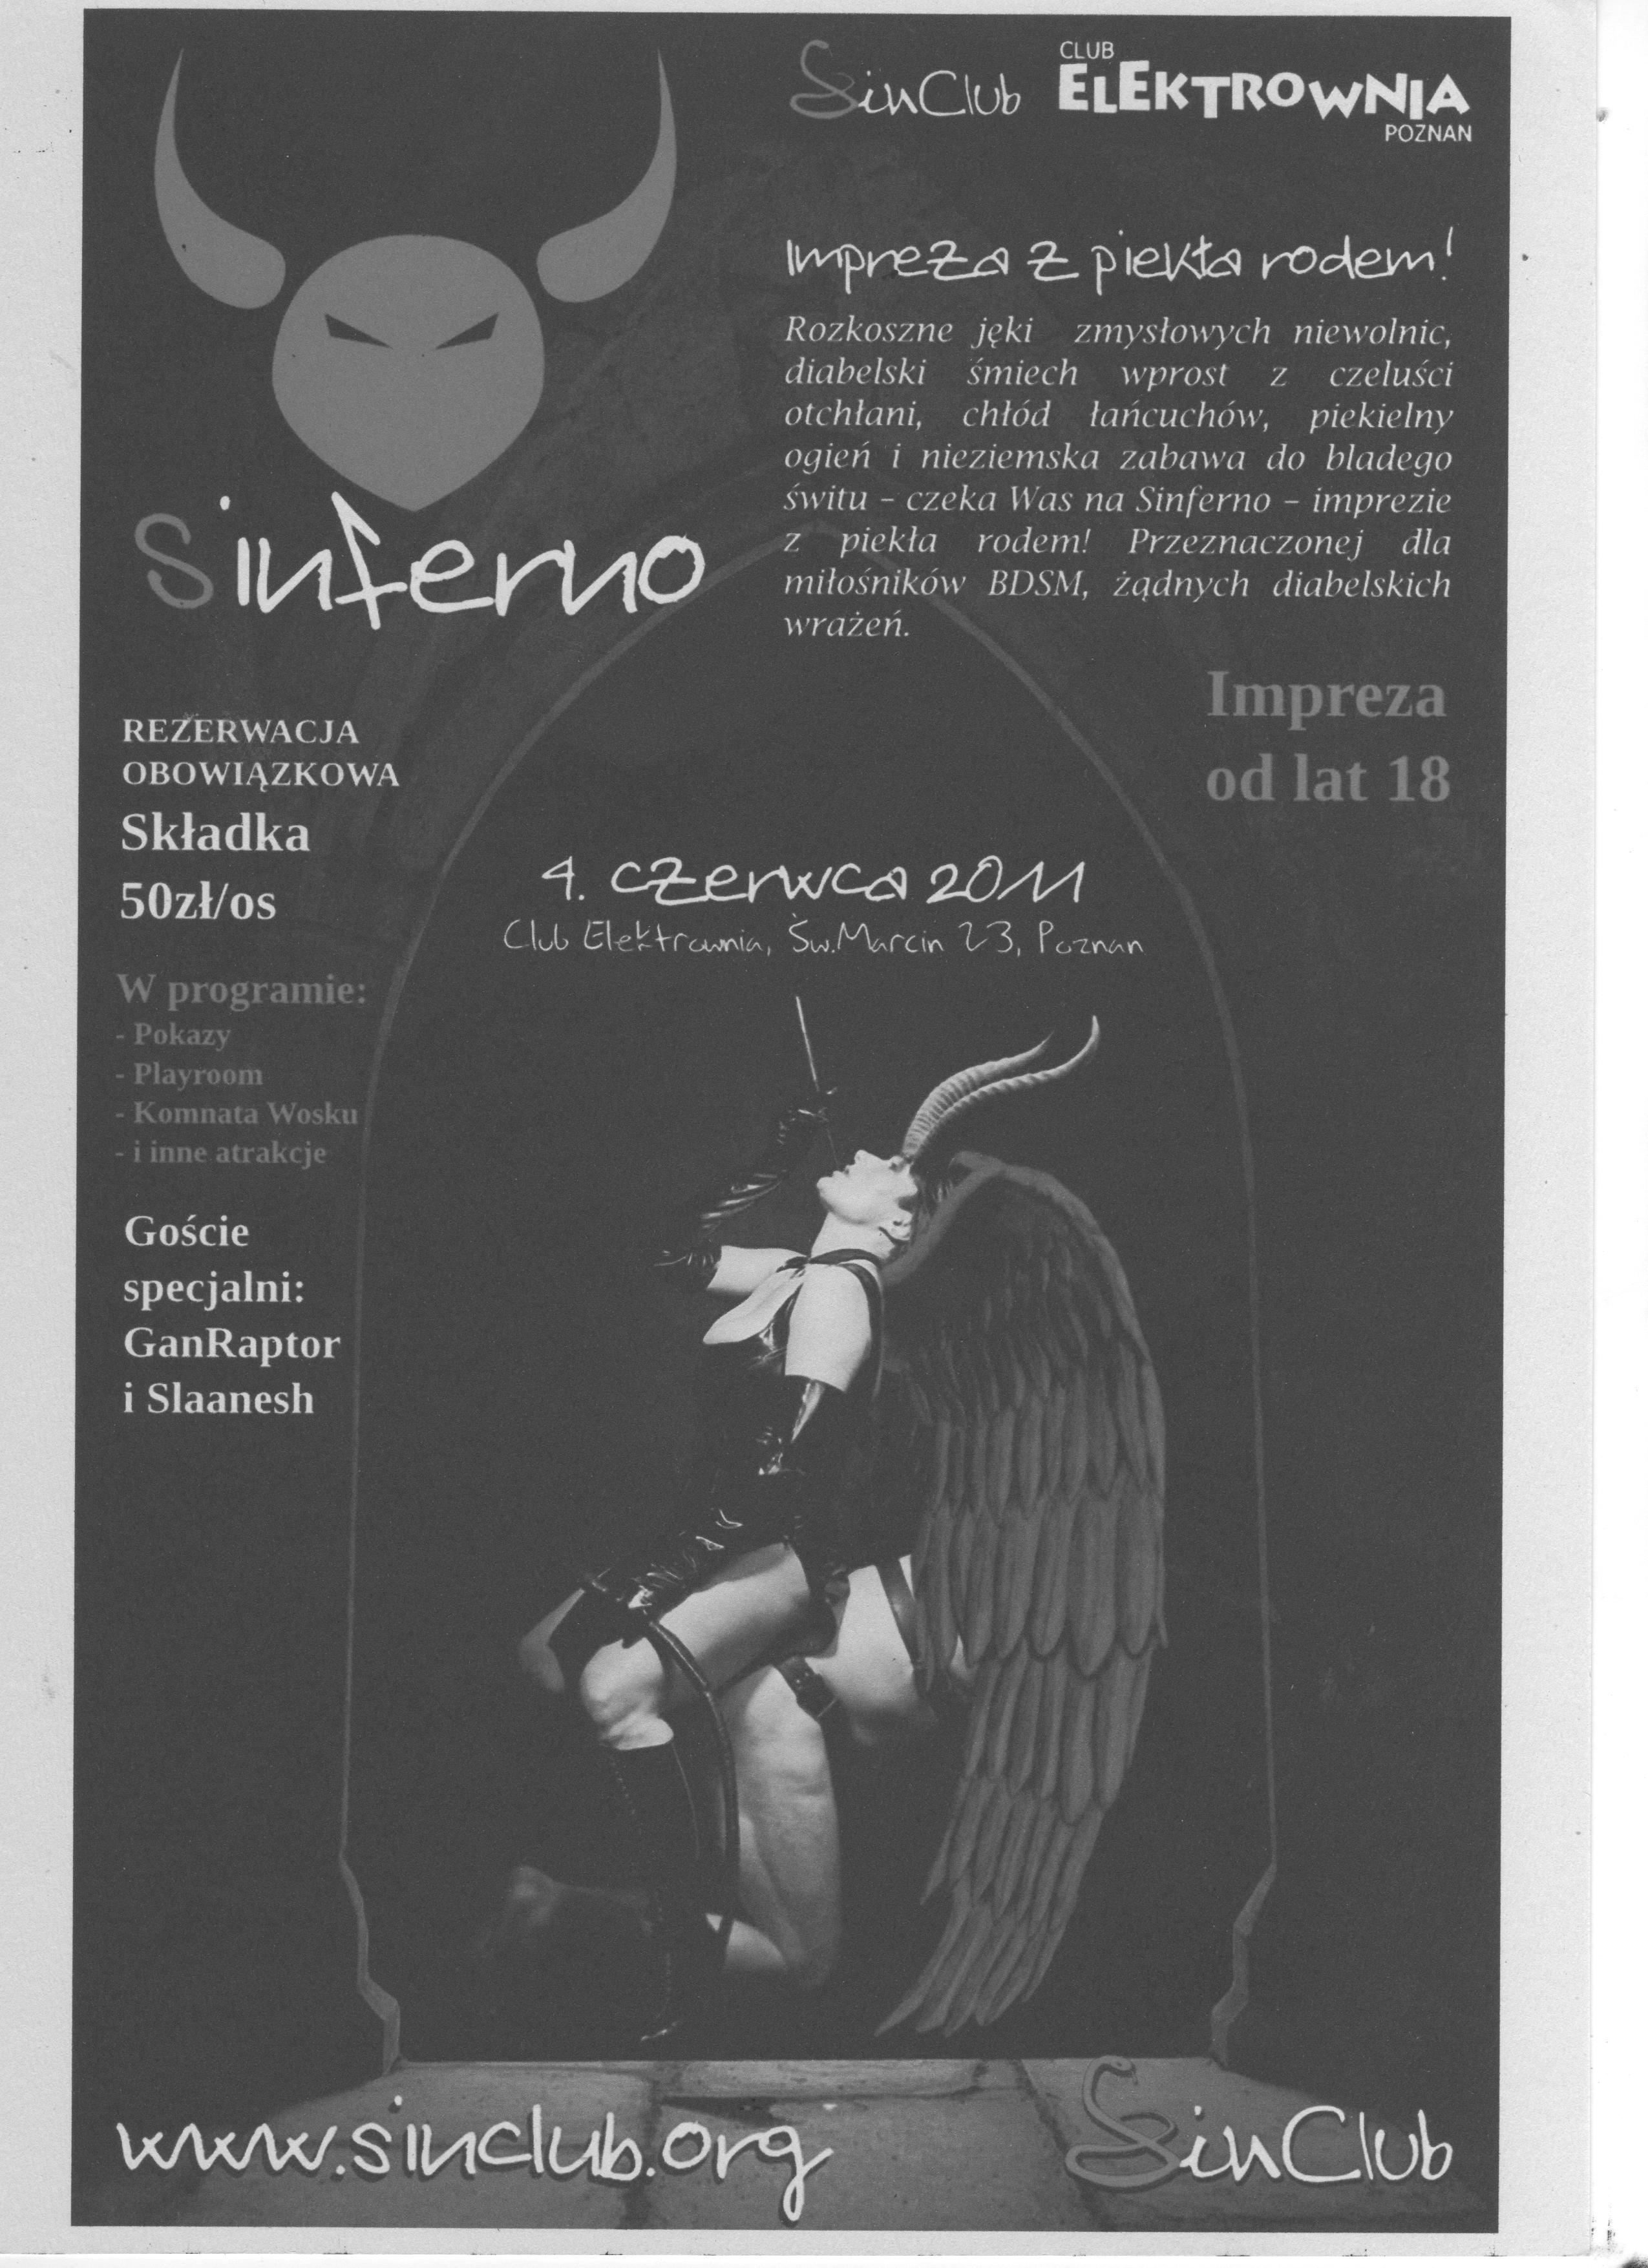 Sinferno 001